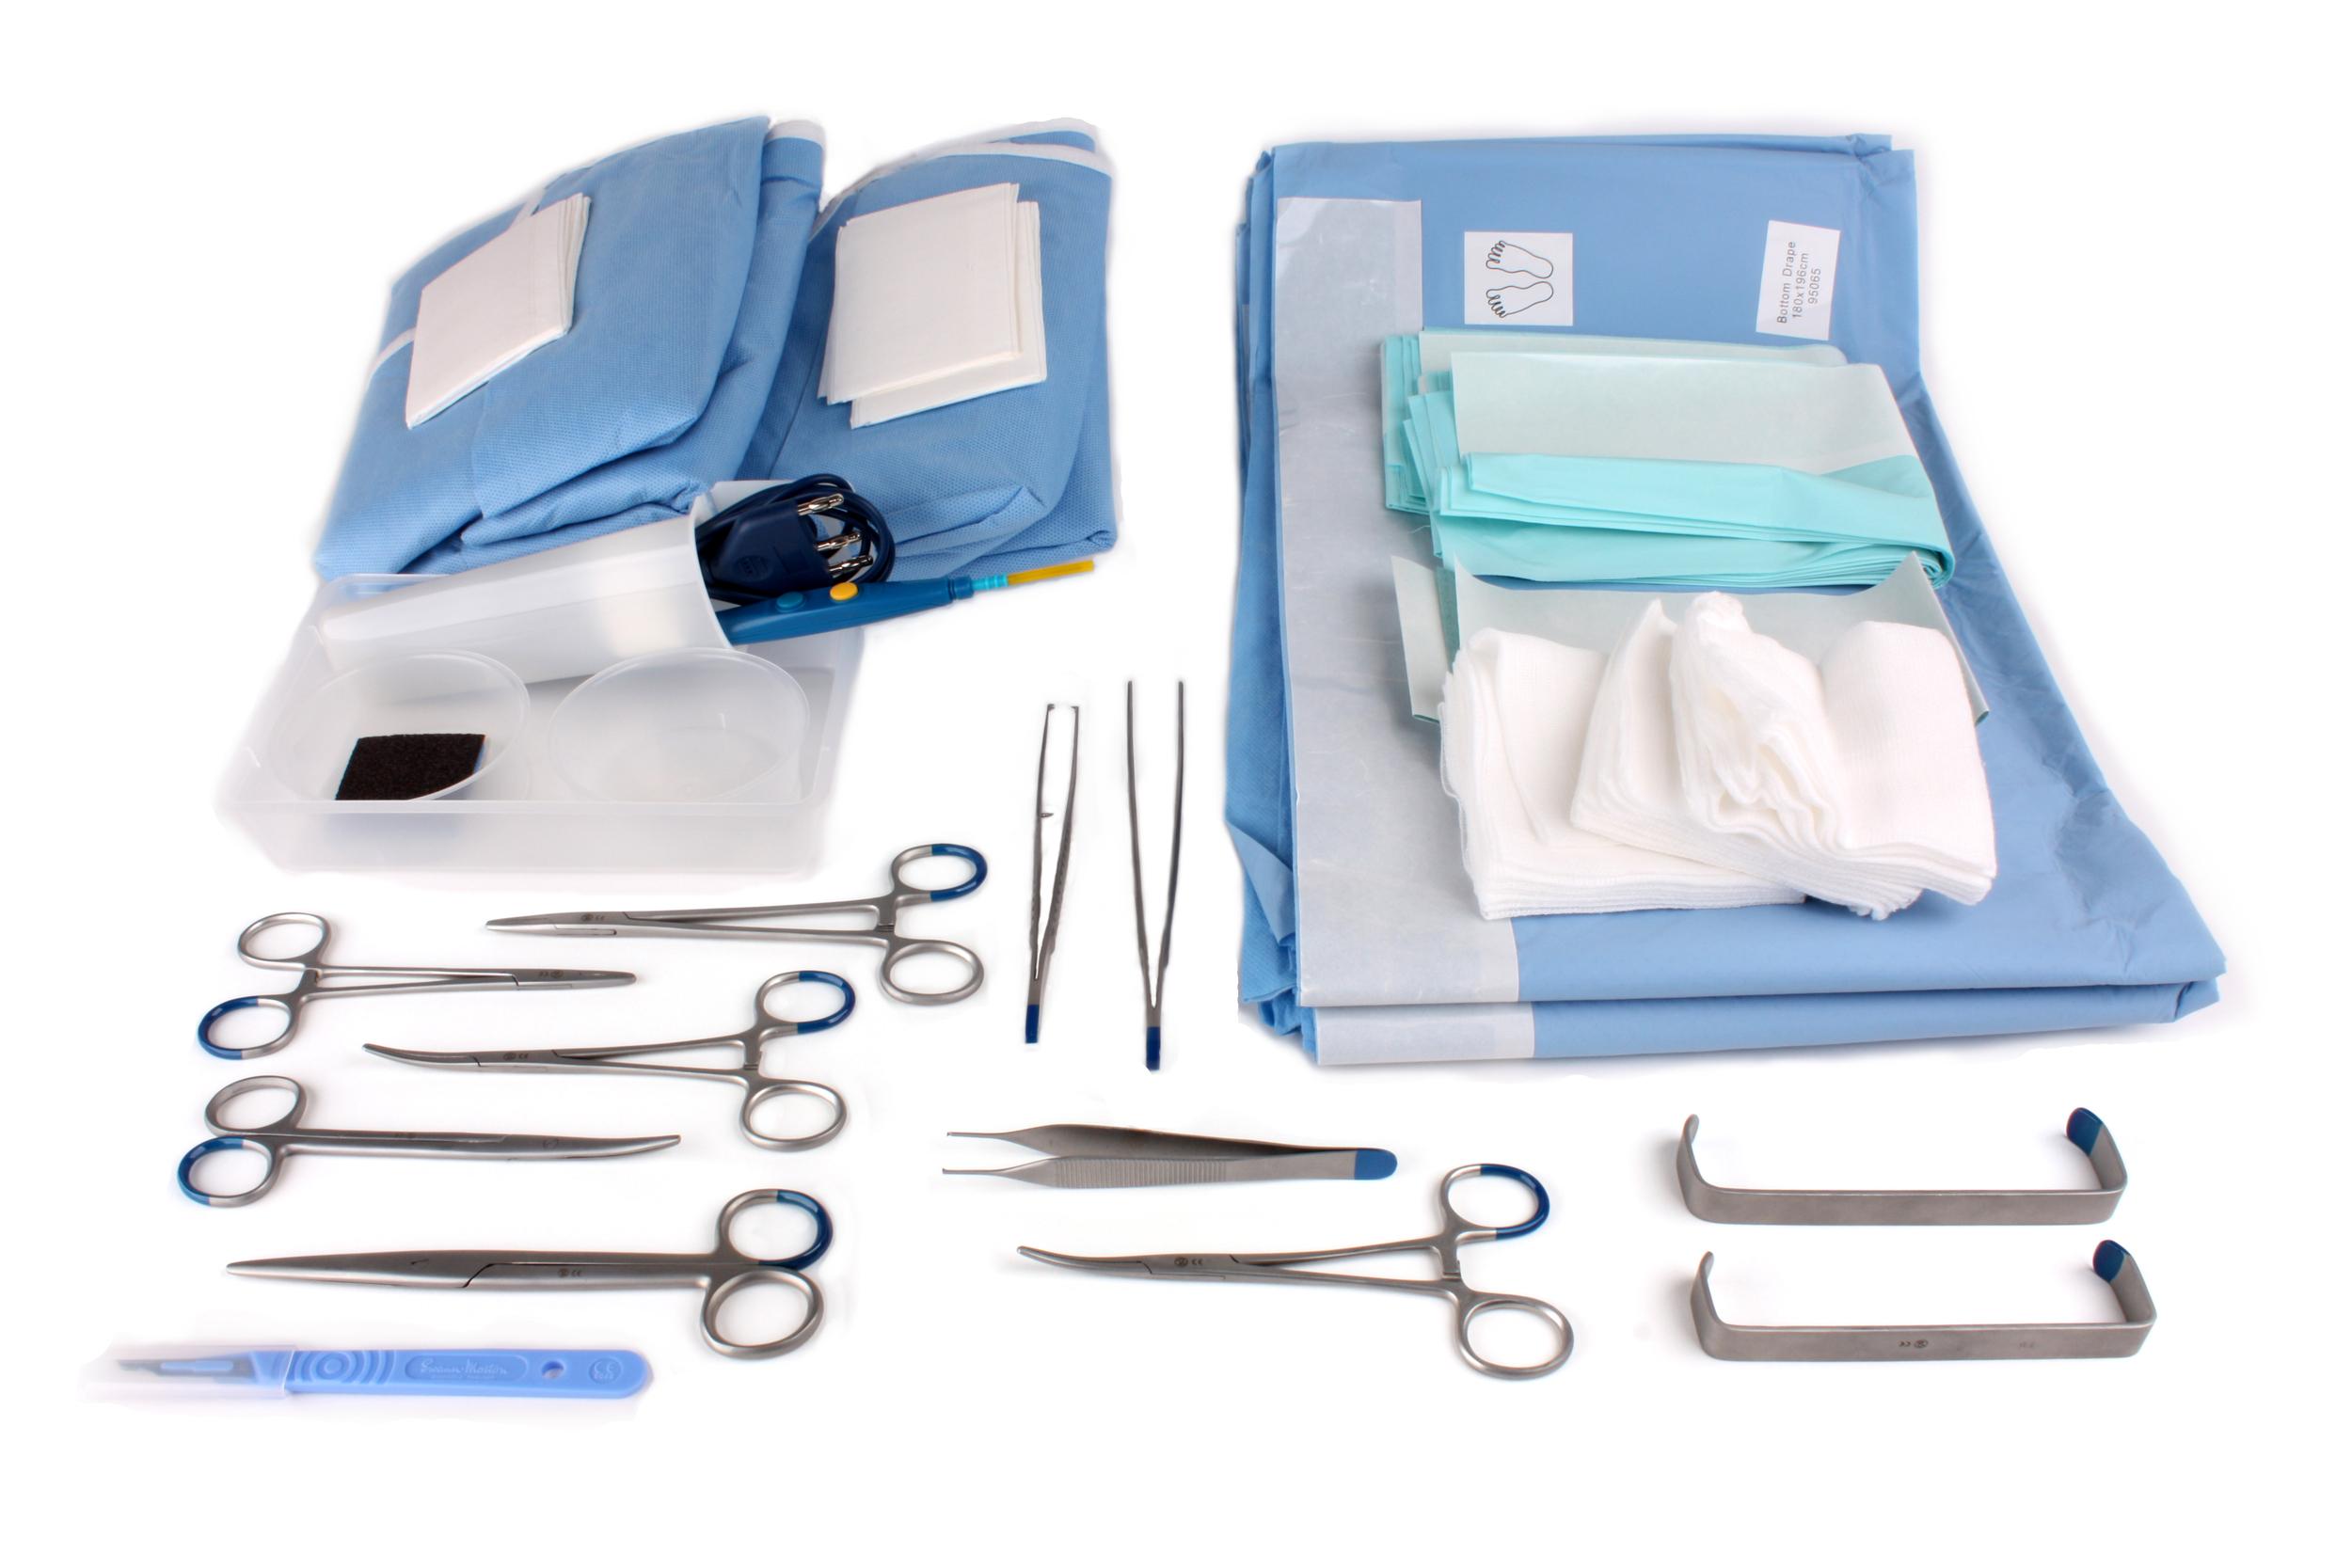 Liber Medical customized disposable mamma augmentatie set